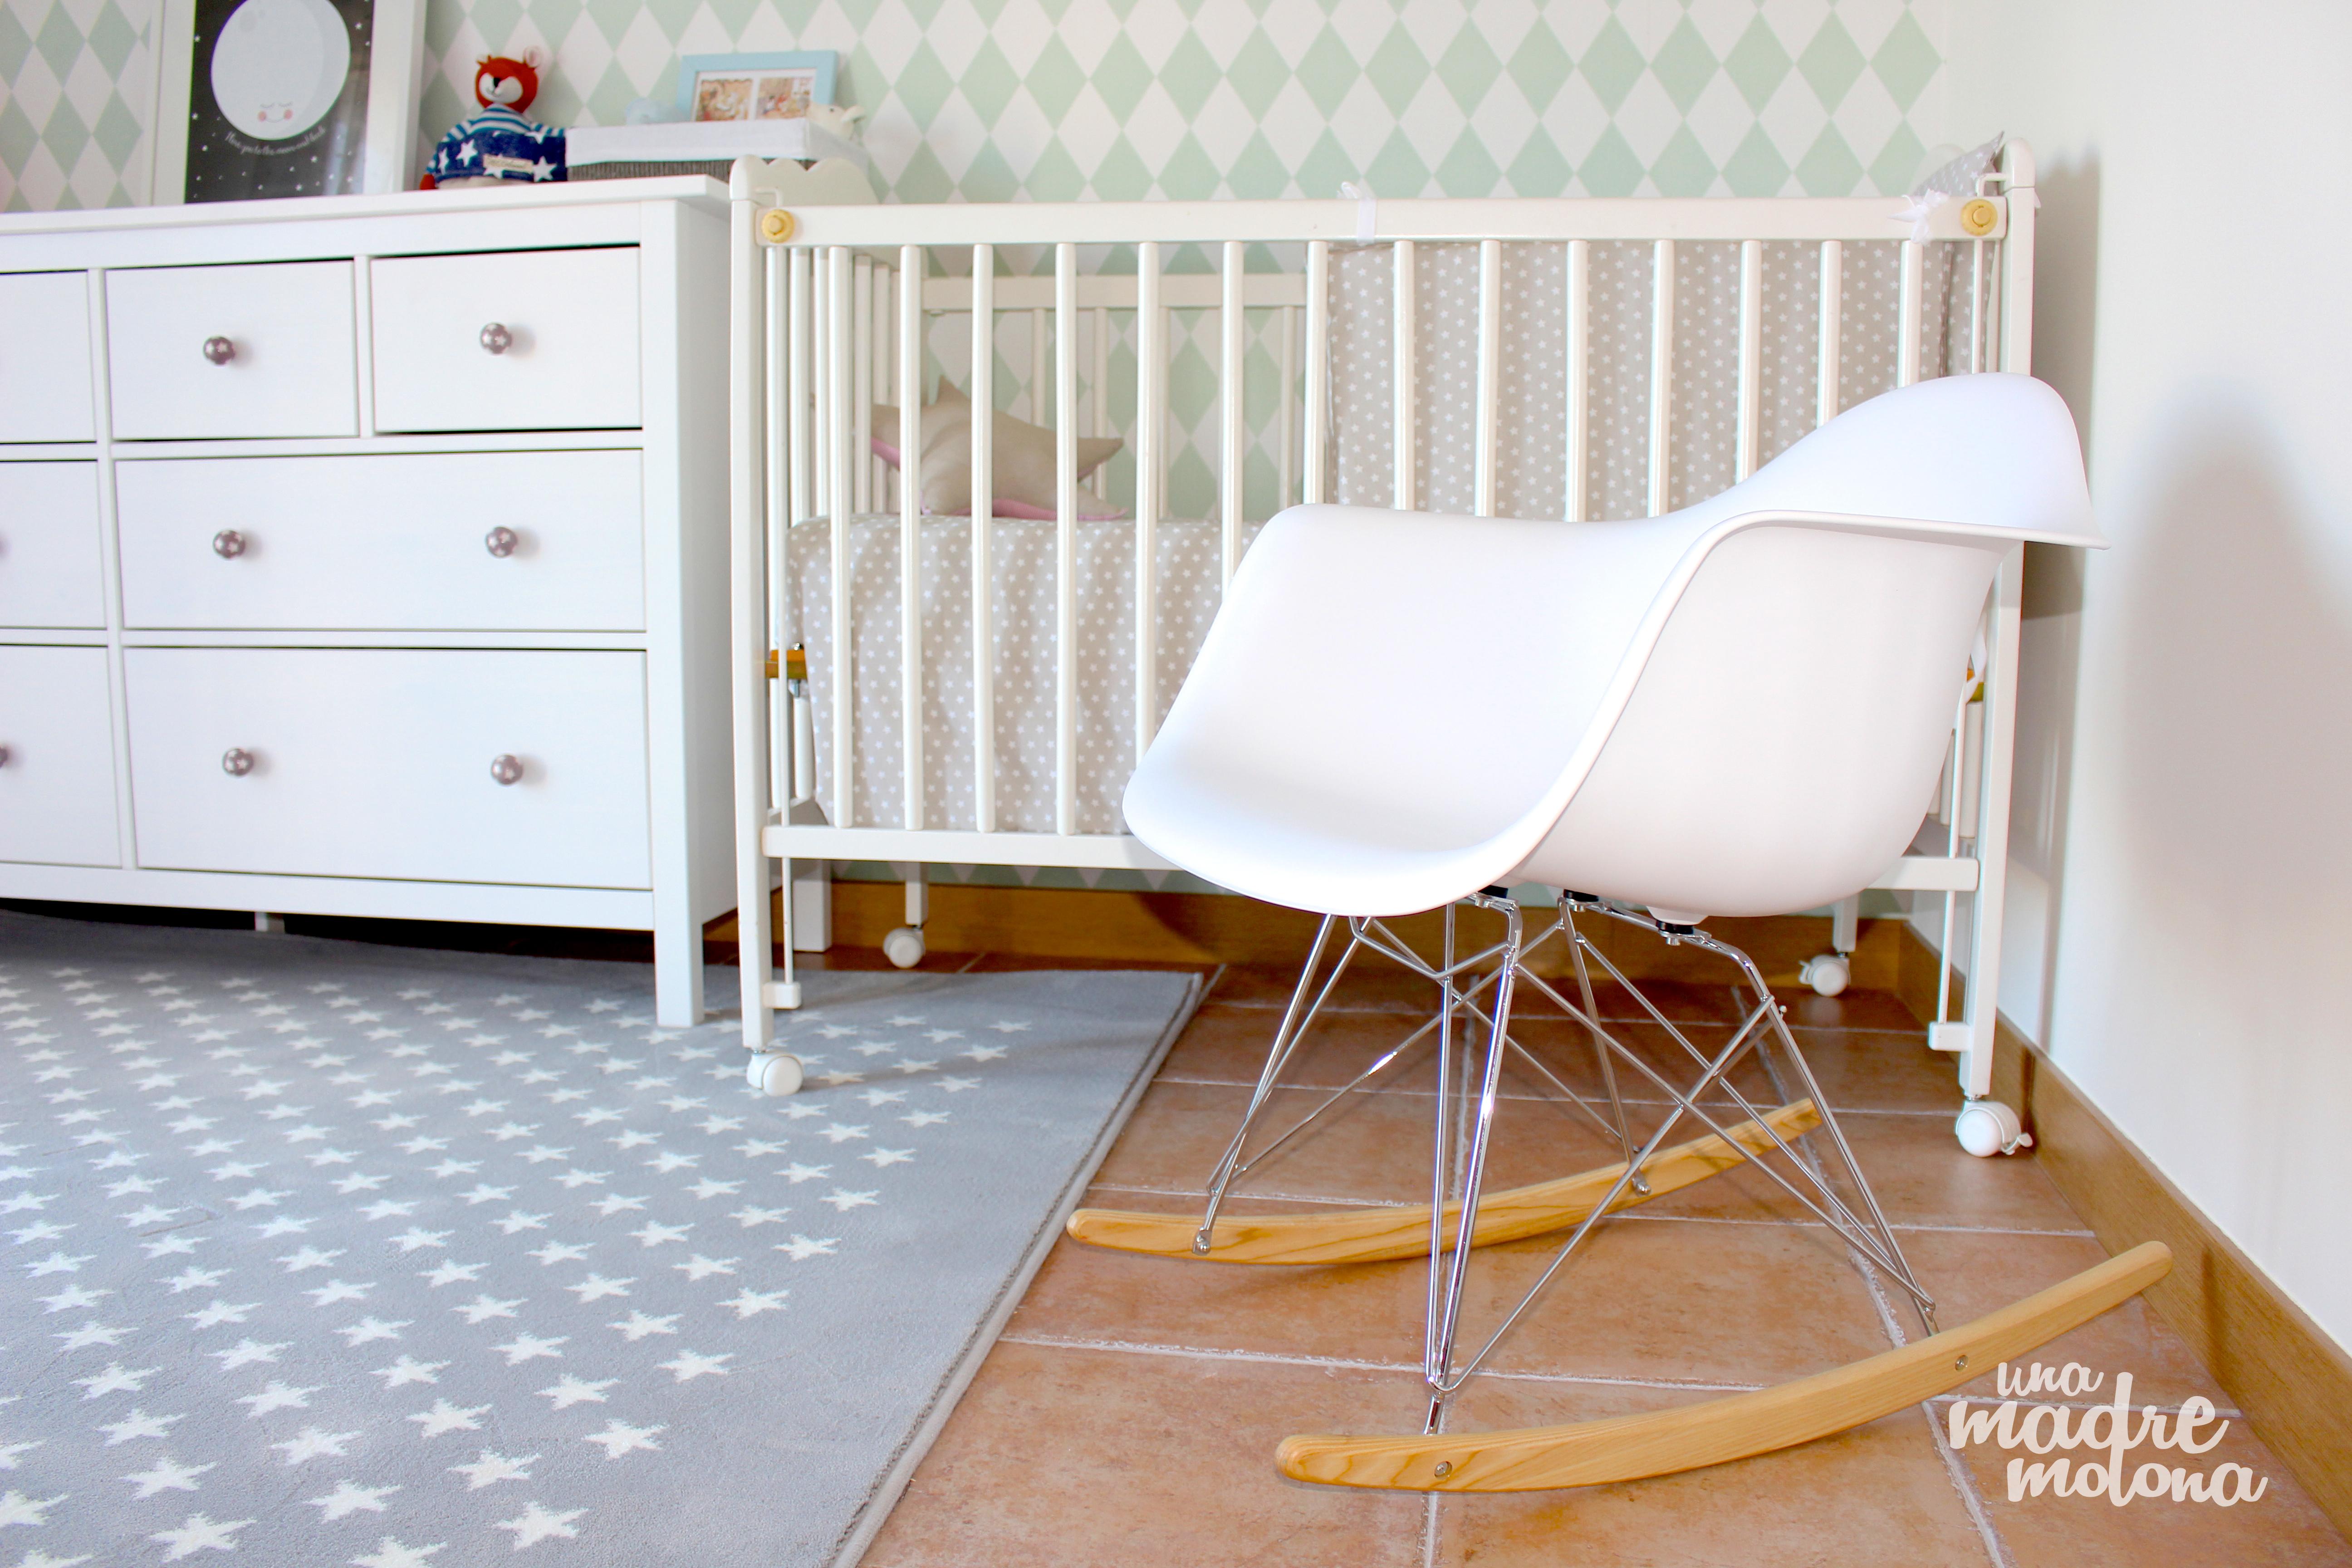 Fantástico Bebés Mecedoras Muebles Silla Fotos - Muebles Para Ideas ...